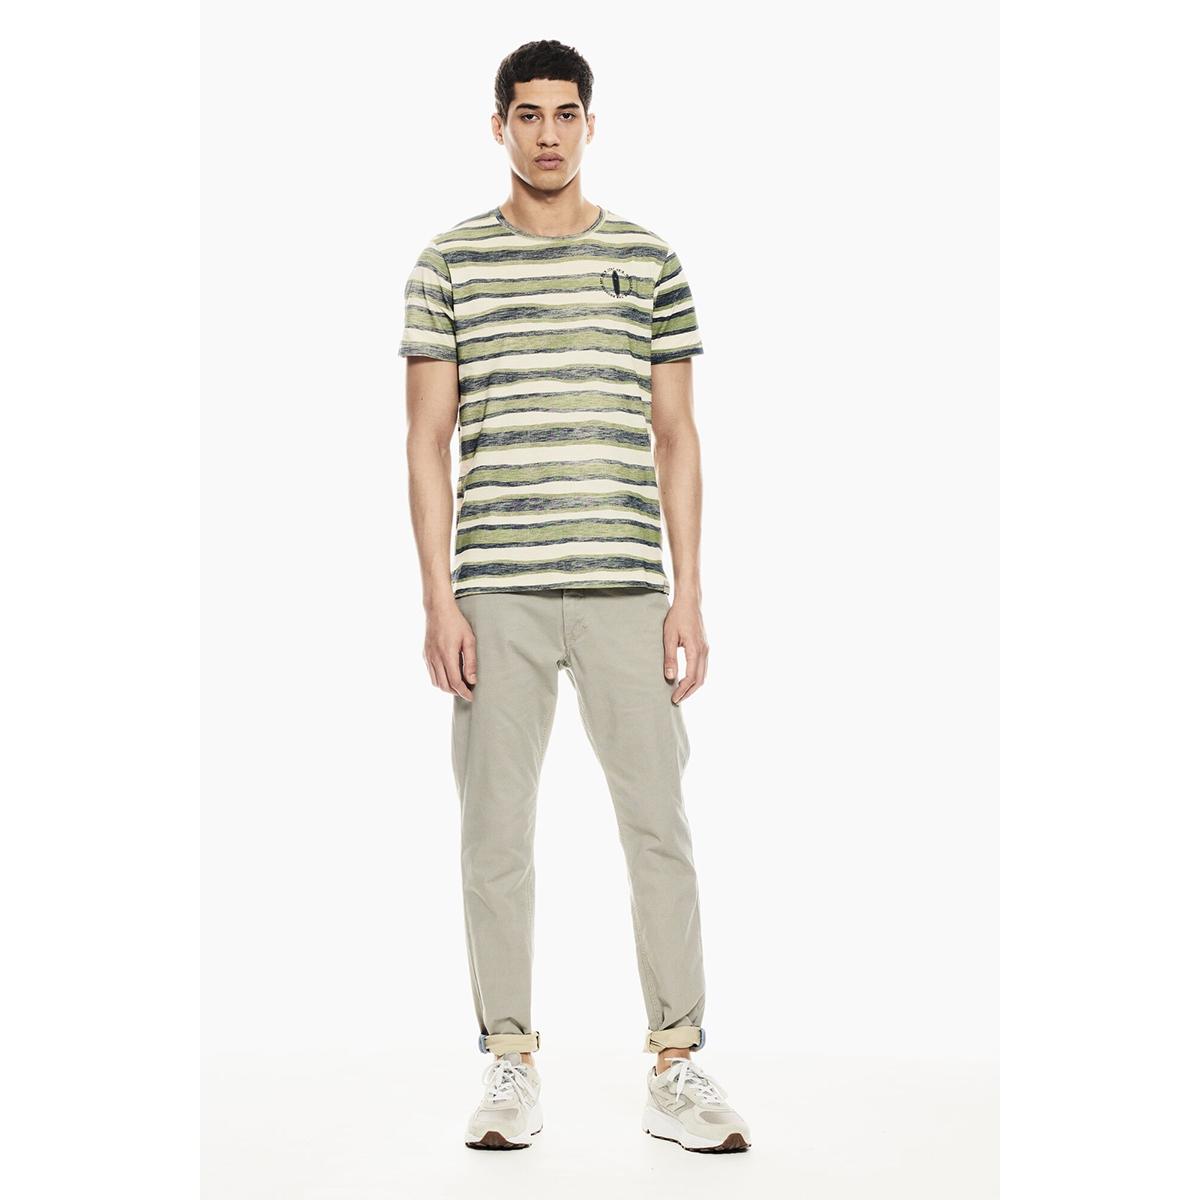 gestreept t shirt p01203 garcia t-shirt 1805 washed army